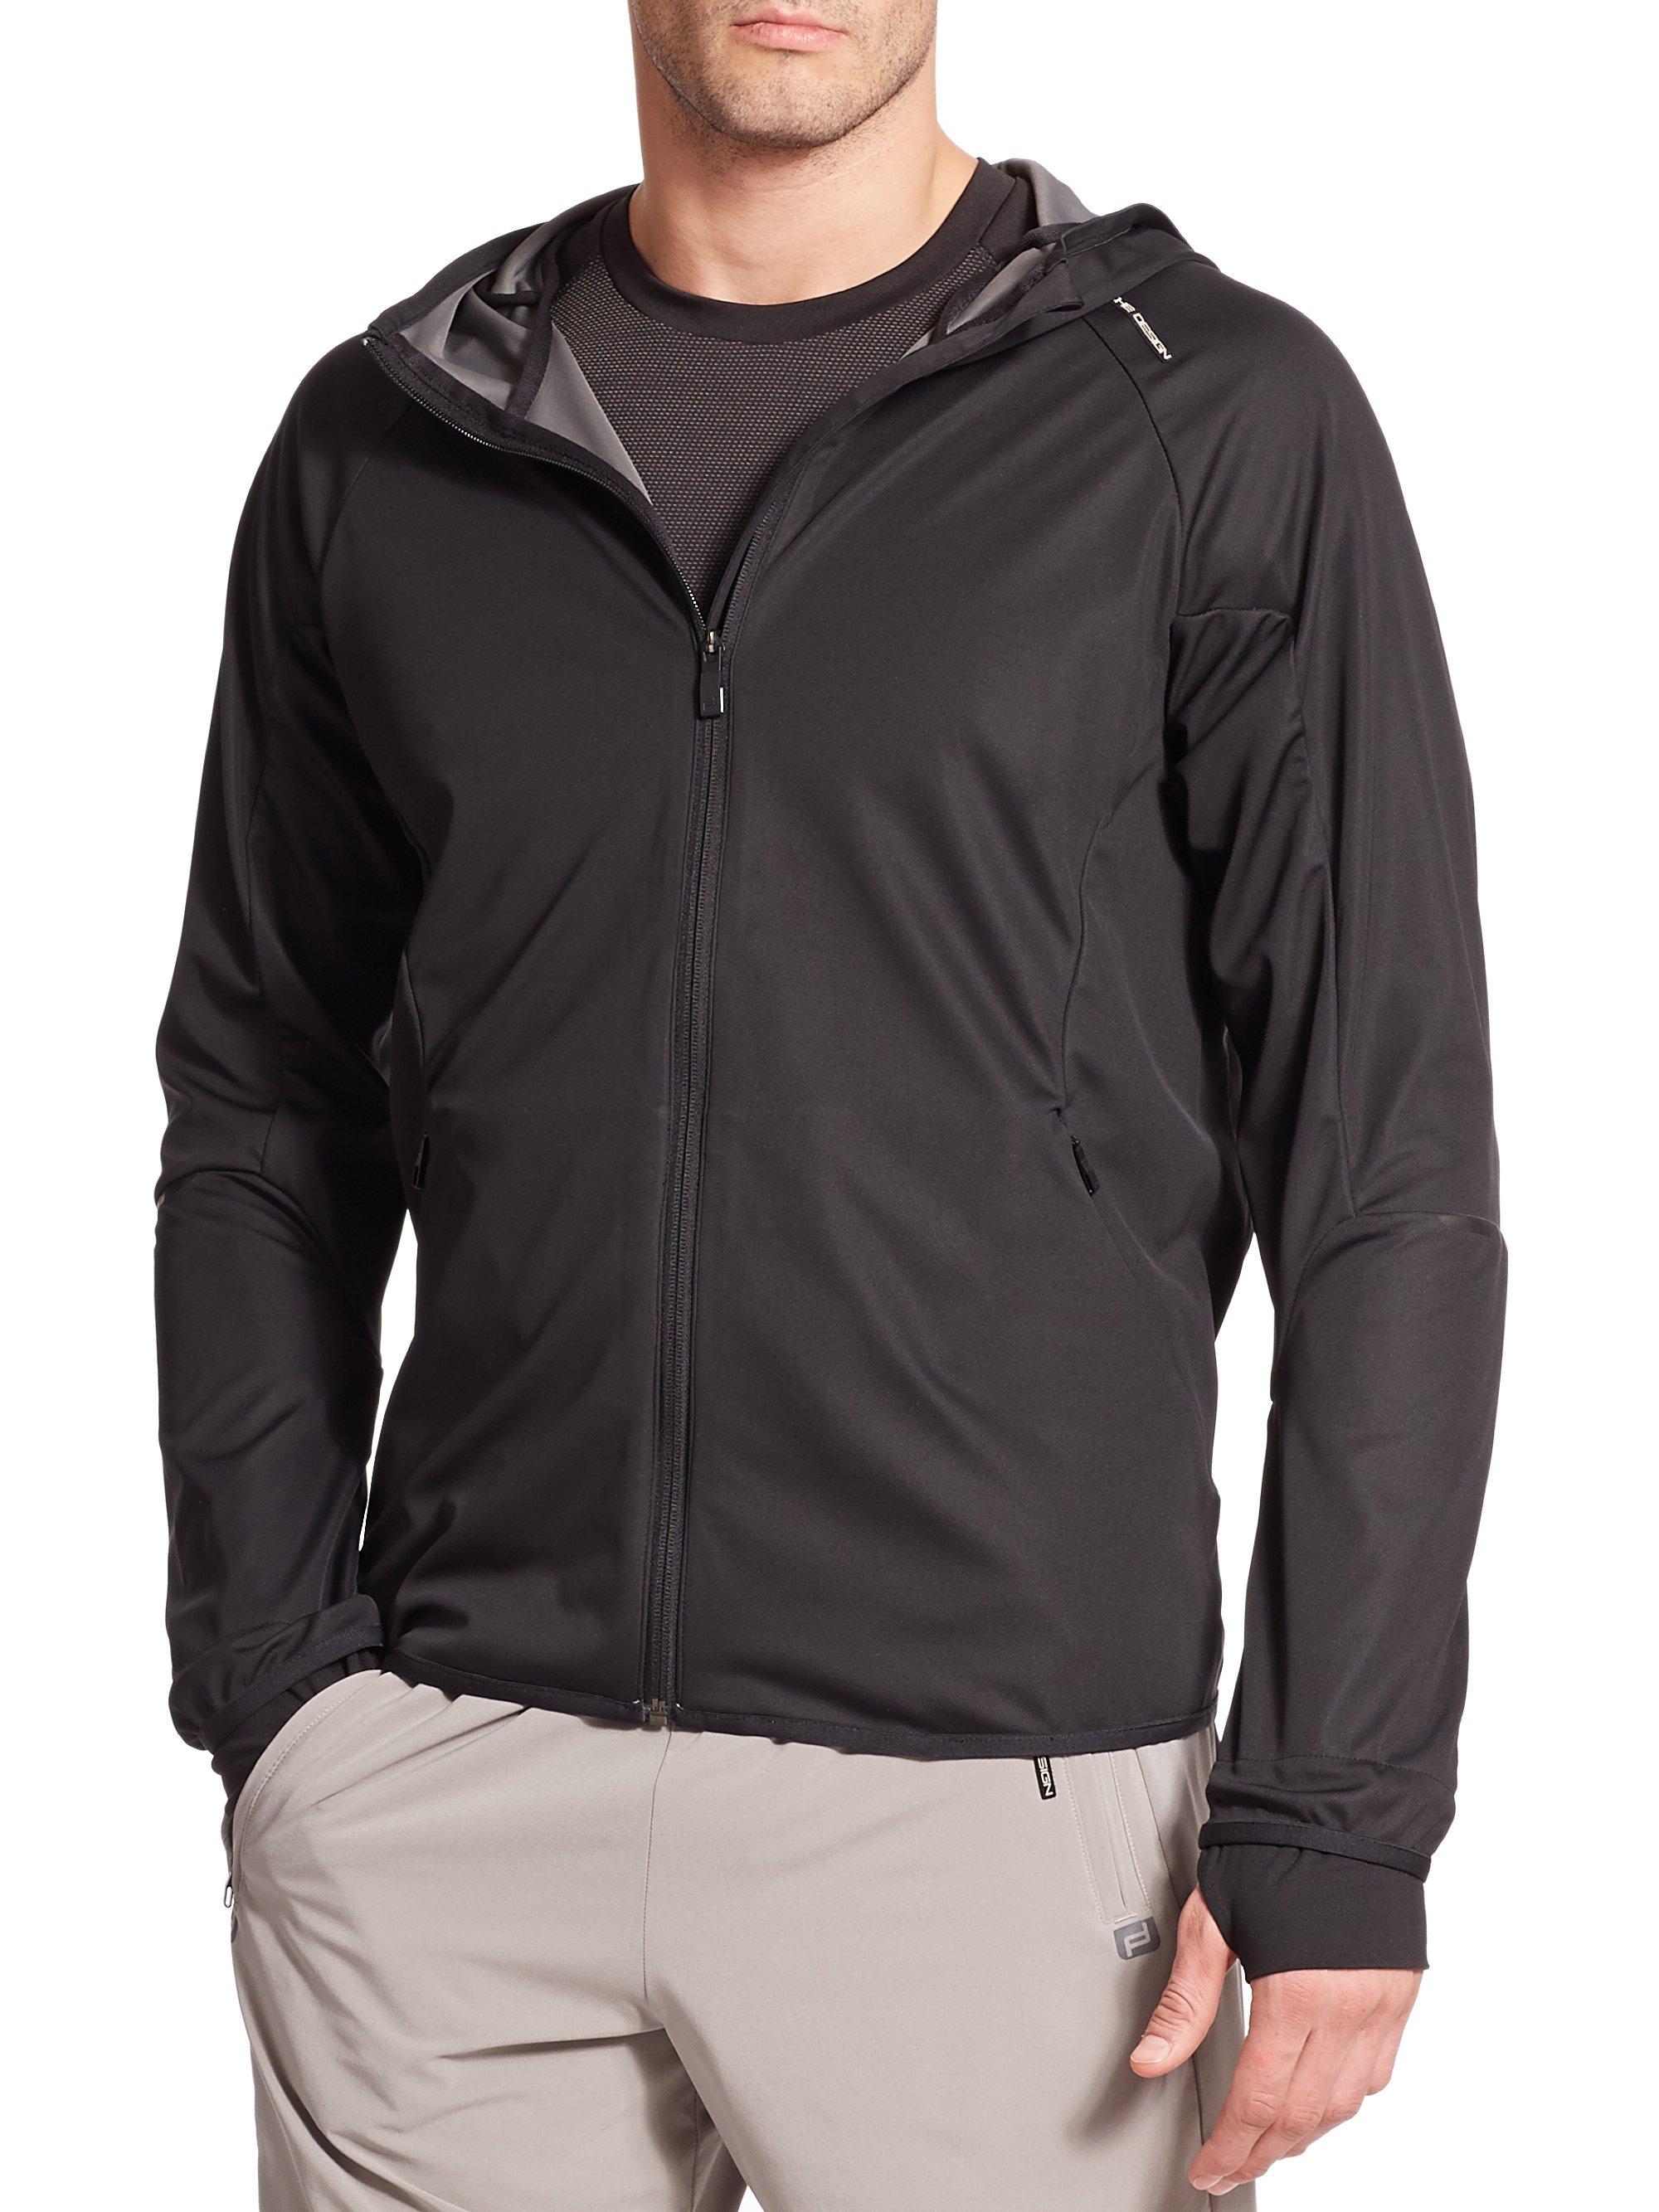 8f1e702a83 Porsche design Windbreaker Jacket in Black for Men